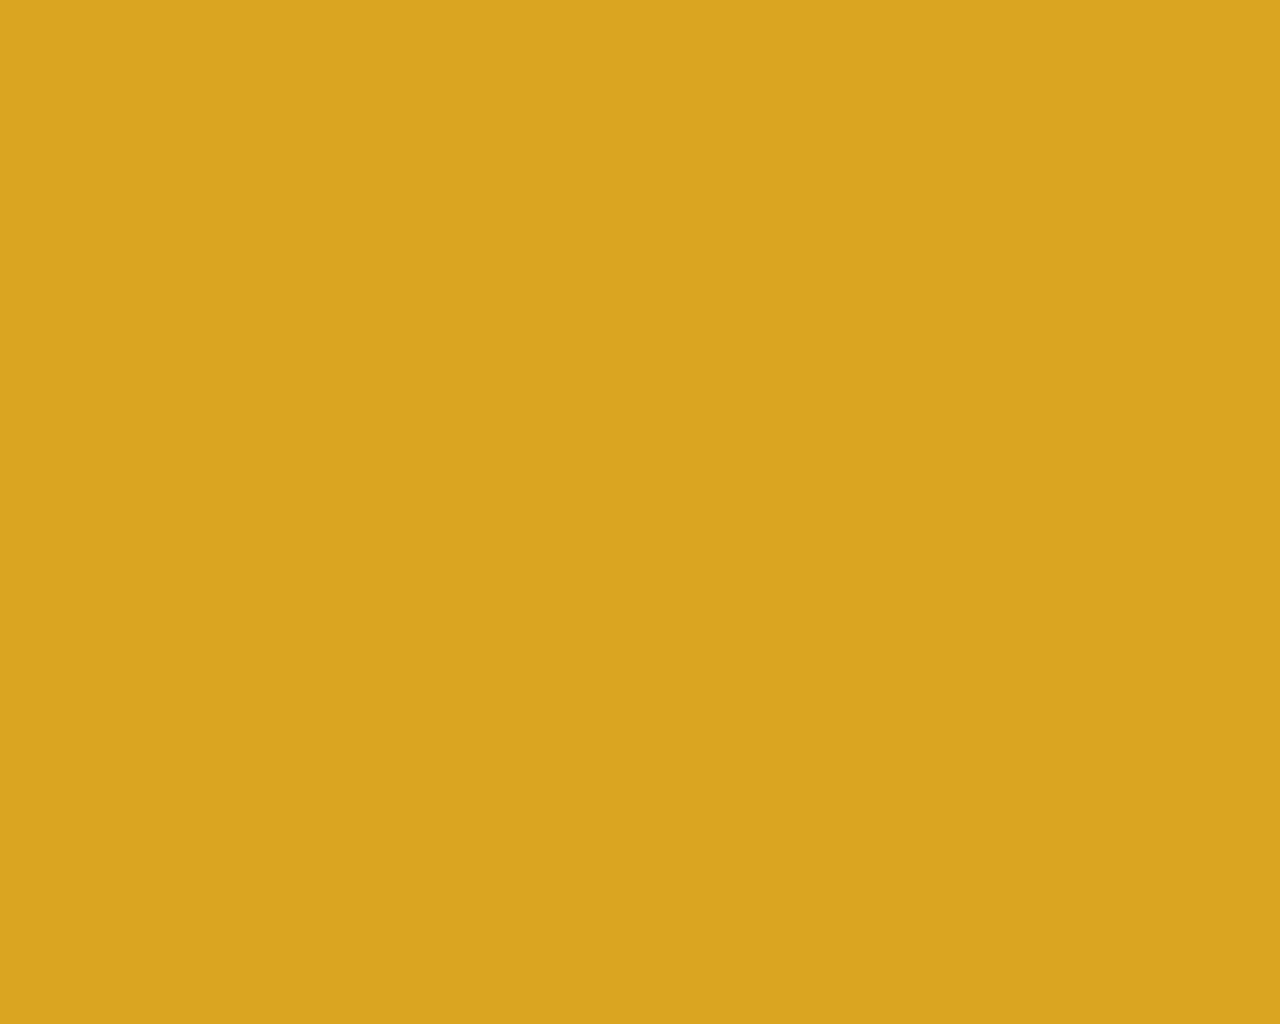 1280x1024 Goldenrod Solid Color Background